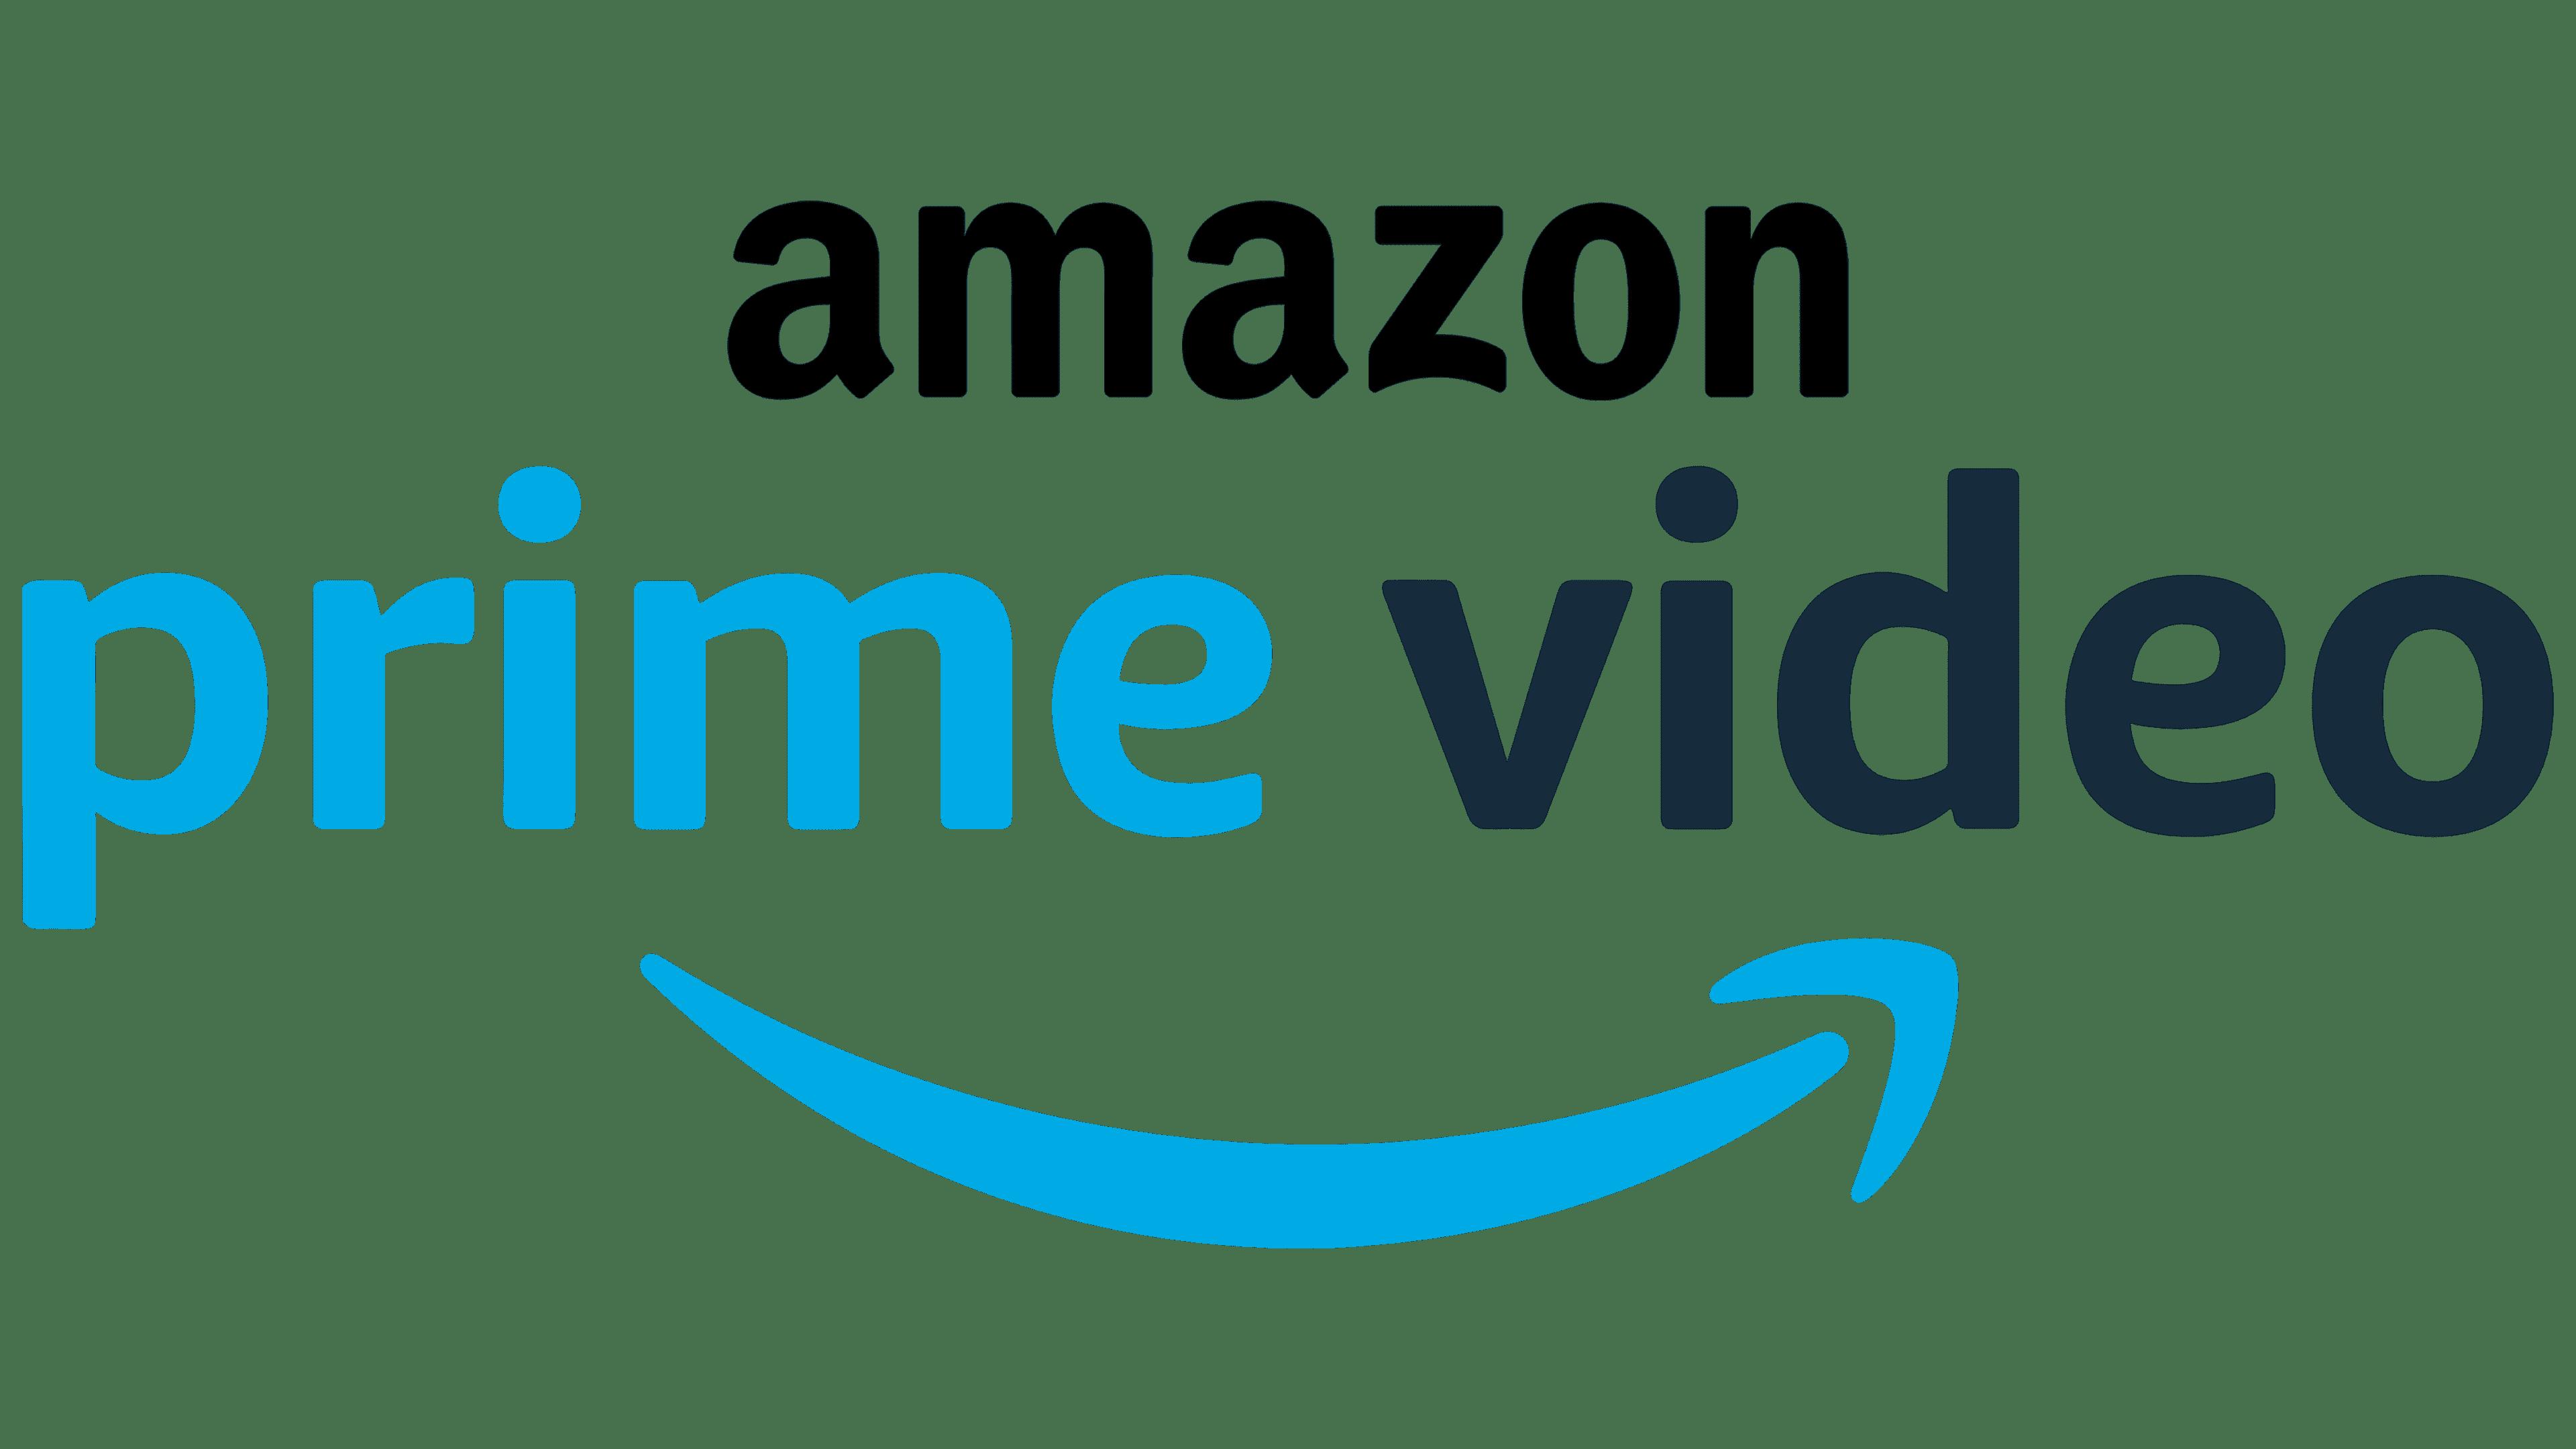 amazon prime video affiliate program